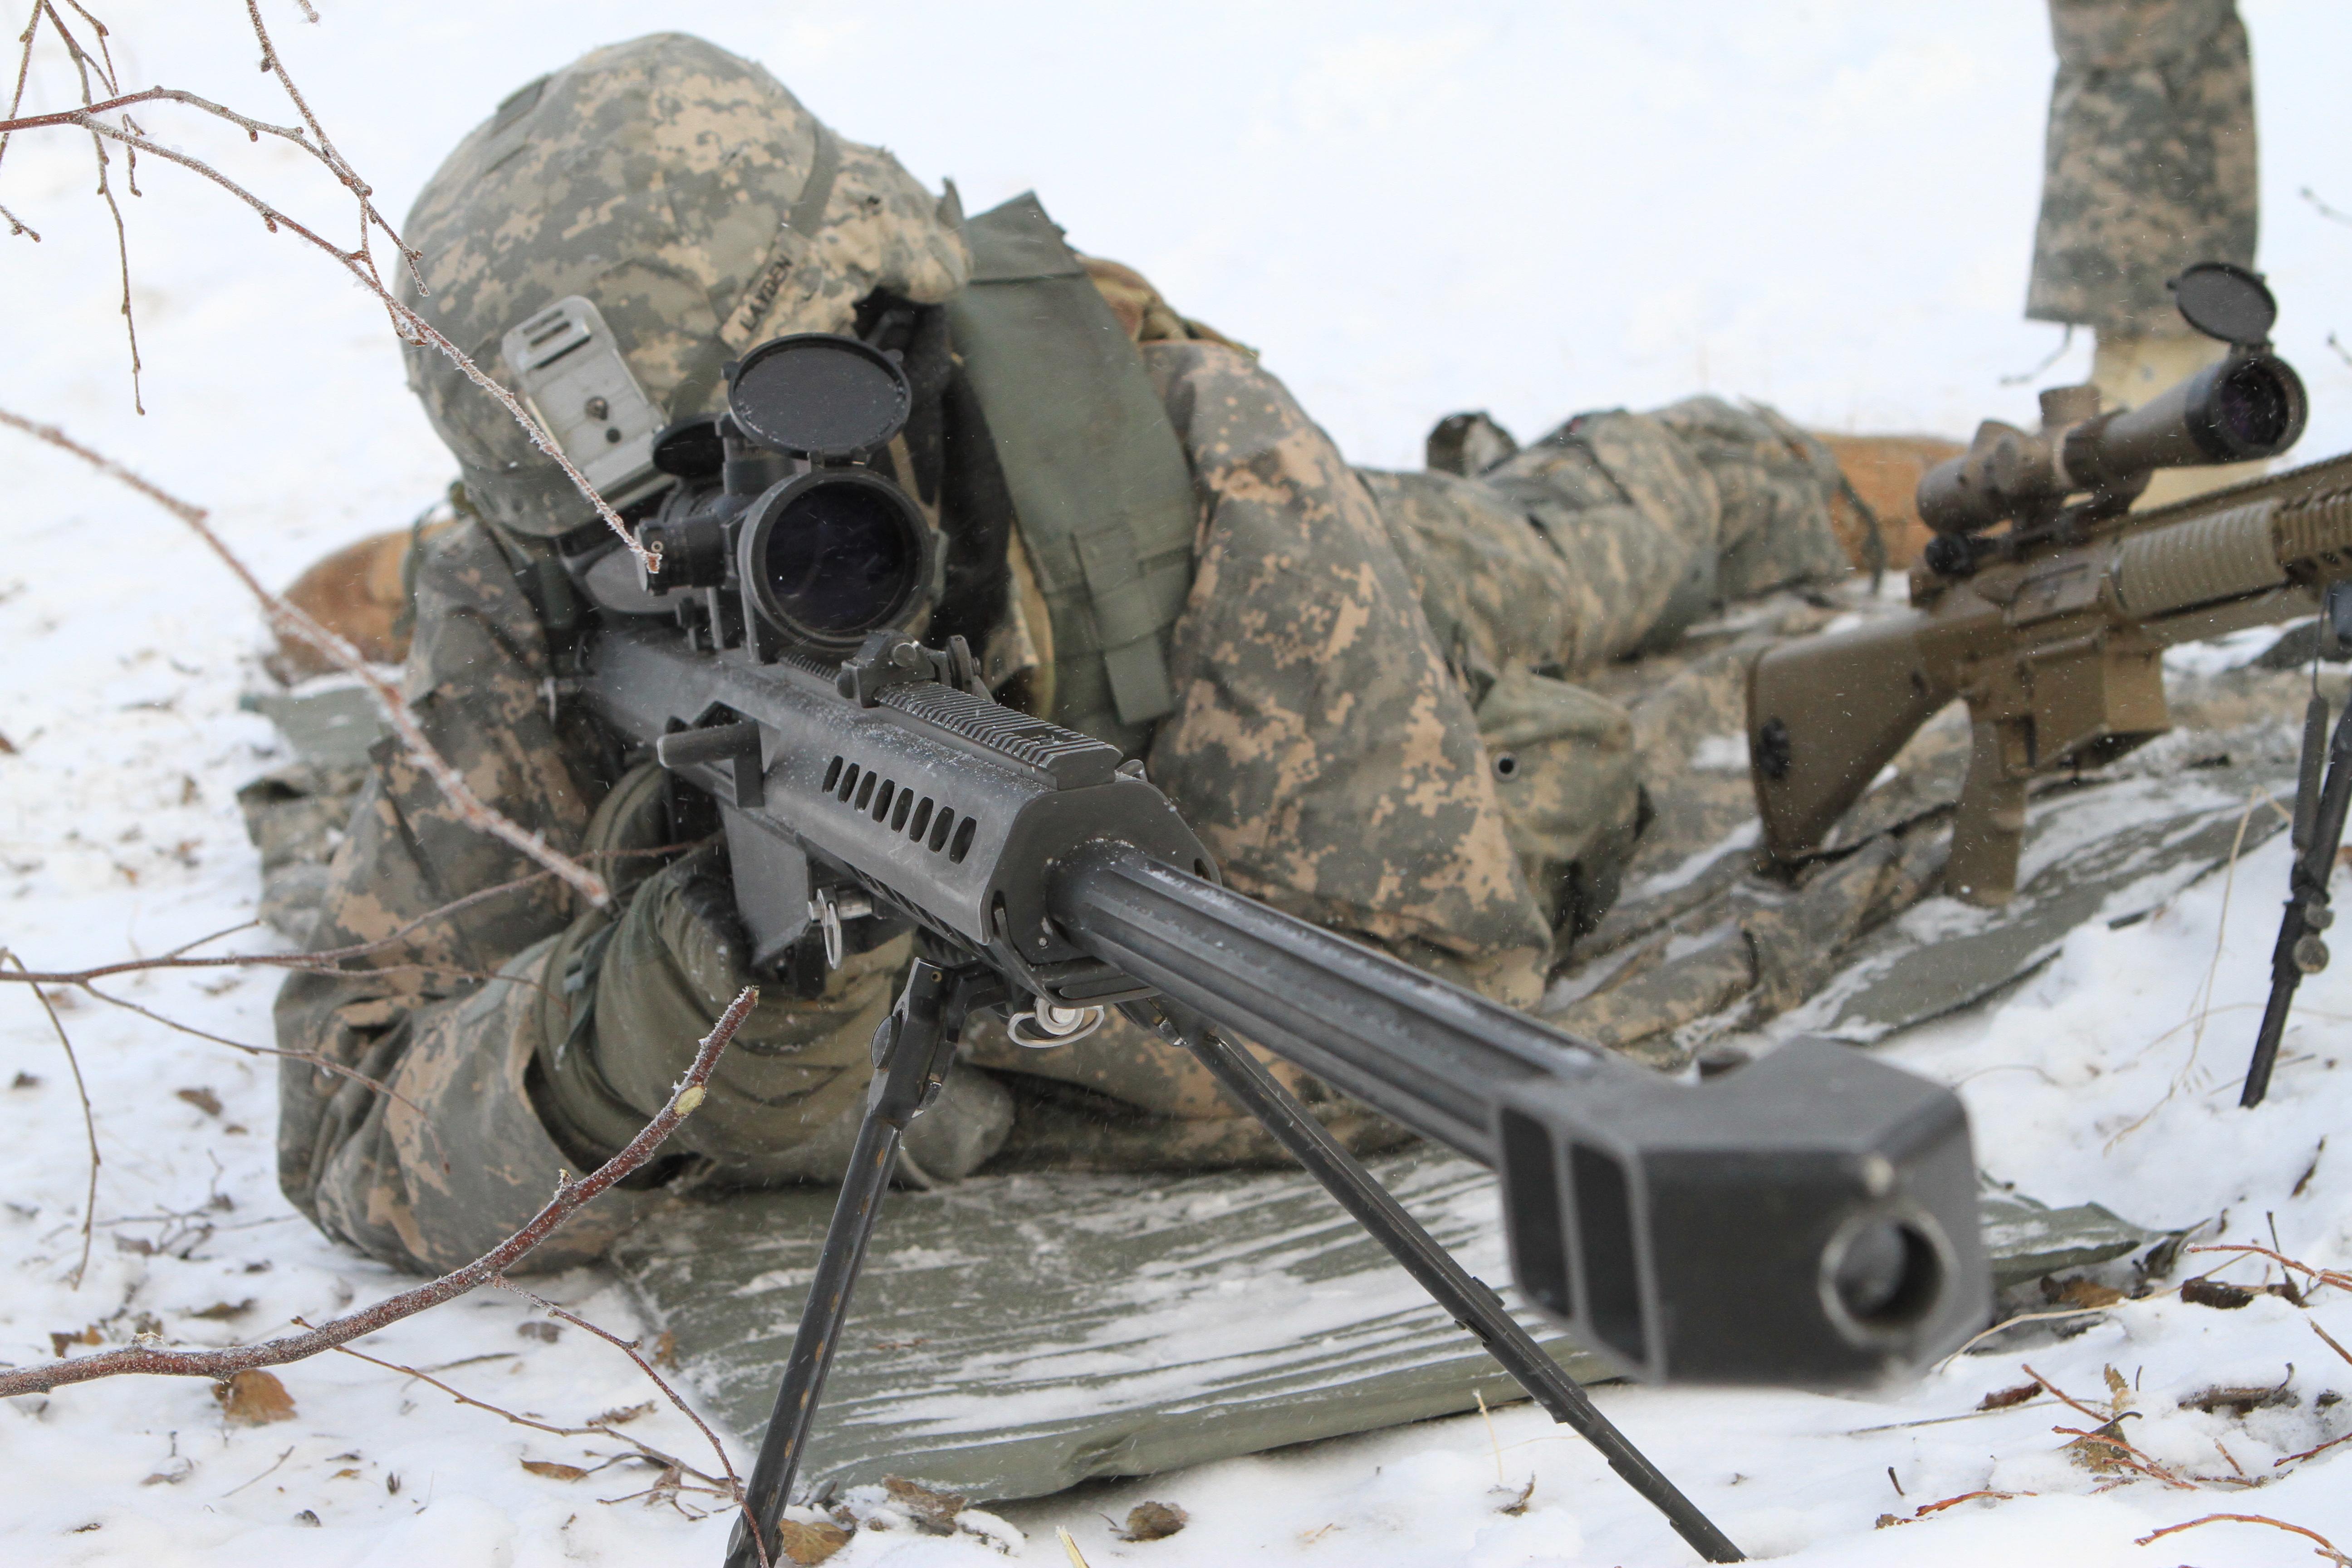 Sniper X feat. Jason Statham v1.1.0 [Mood] Immagini